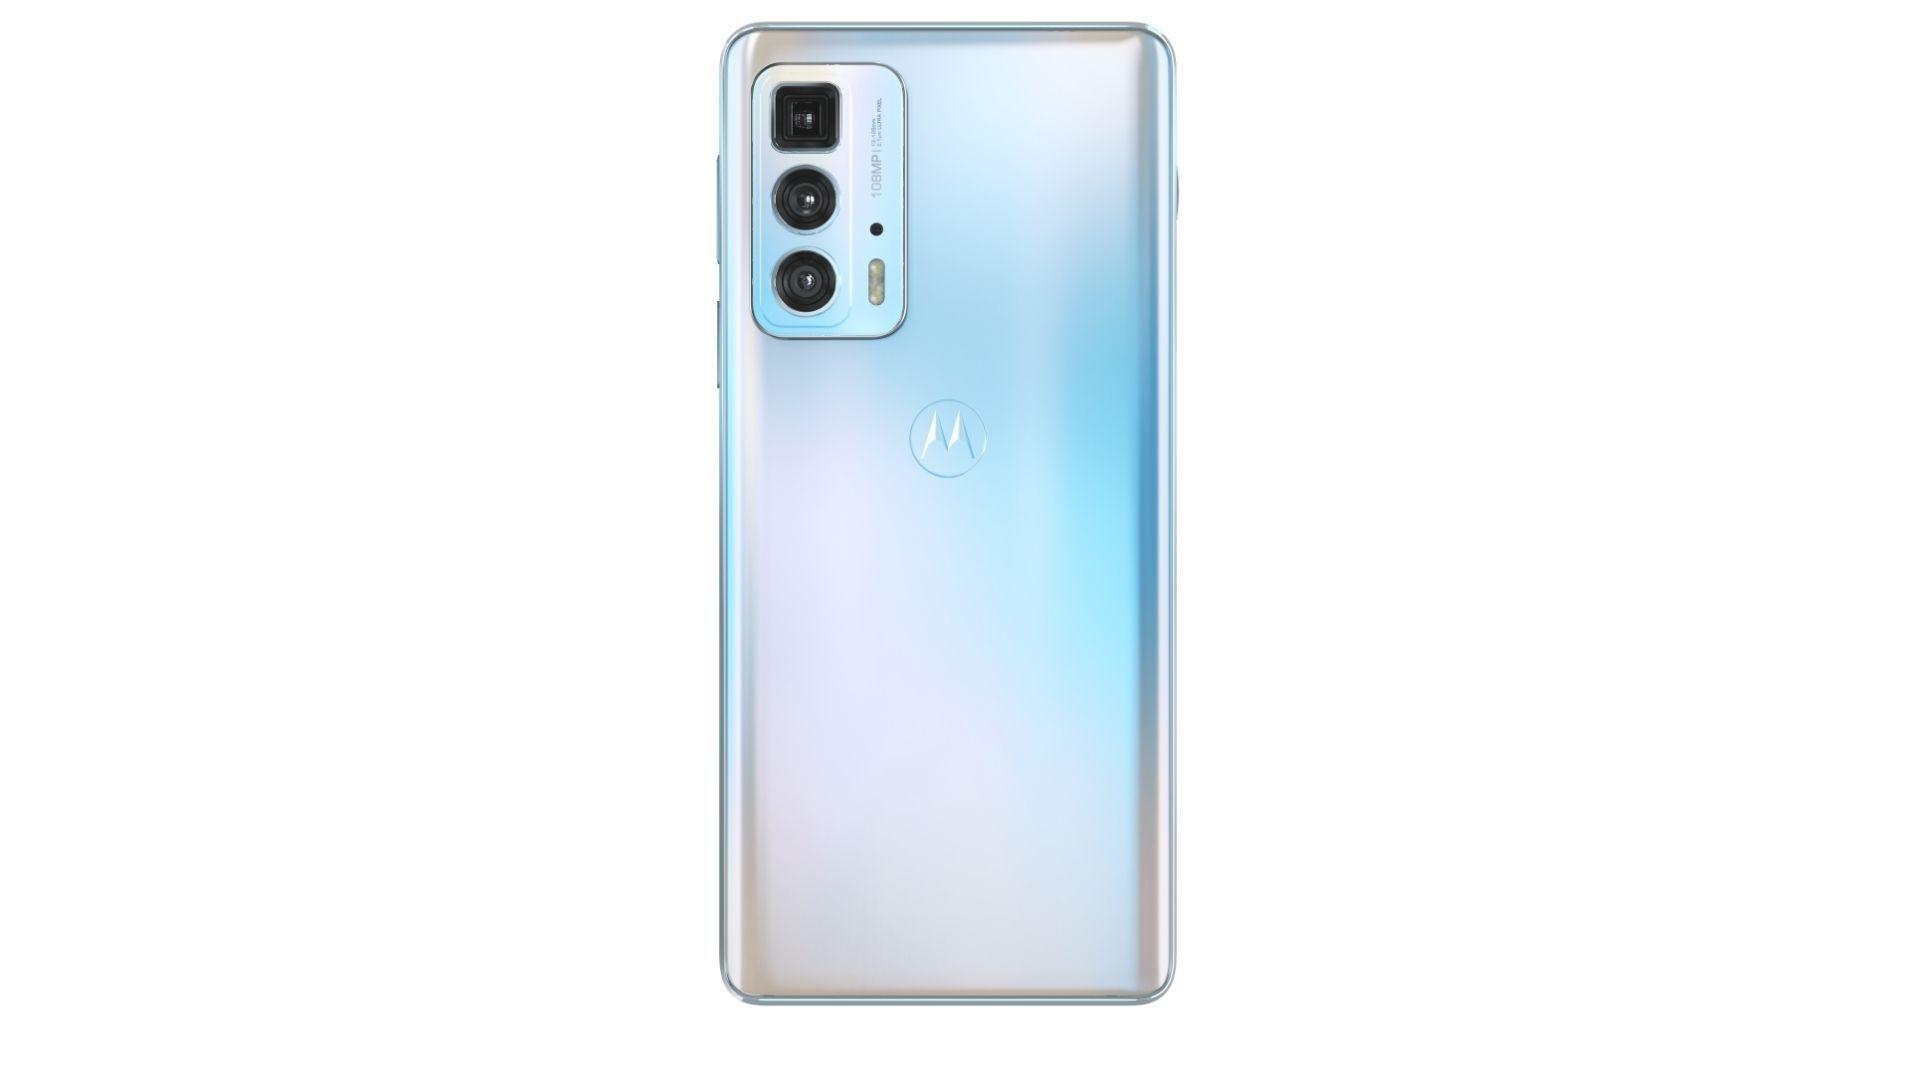 Parte traseira do Motorola Edge 20 Pro